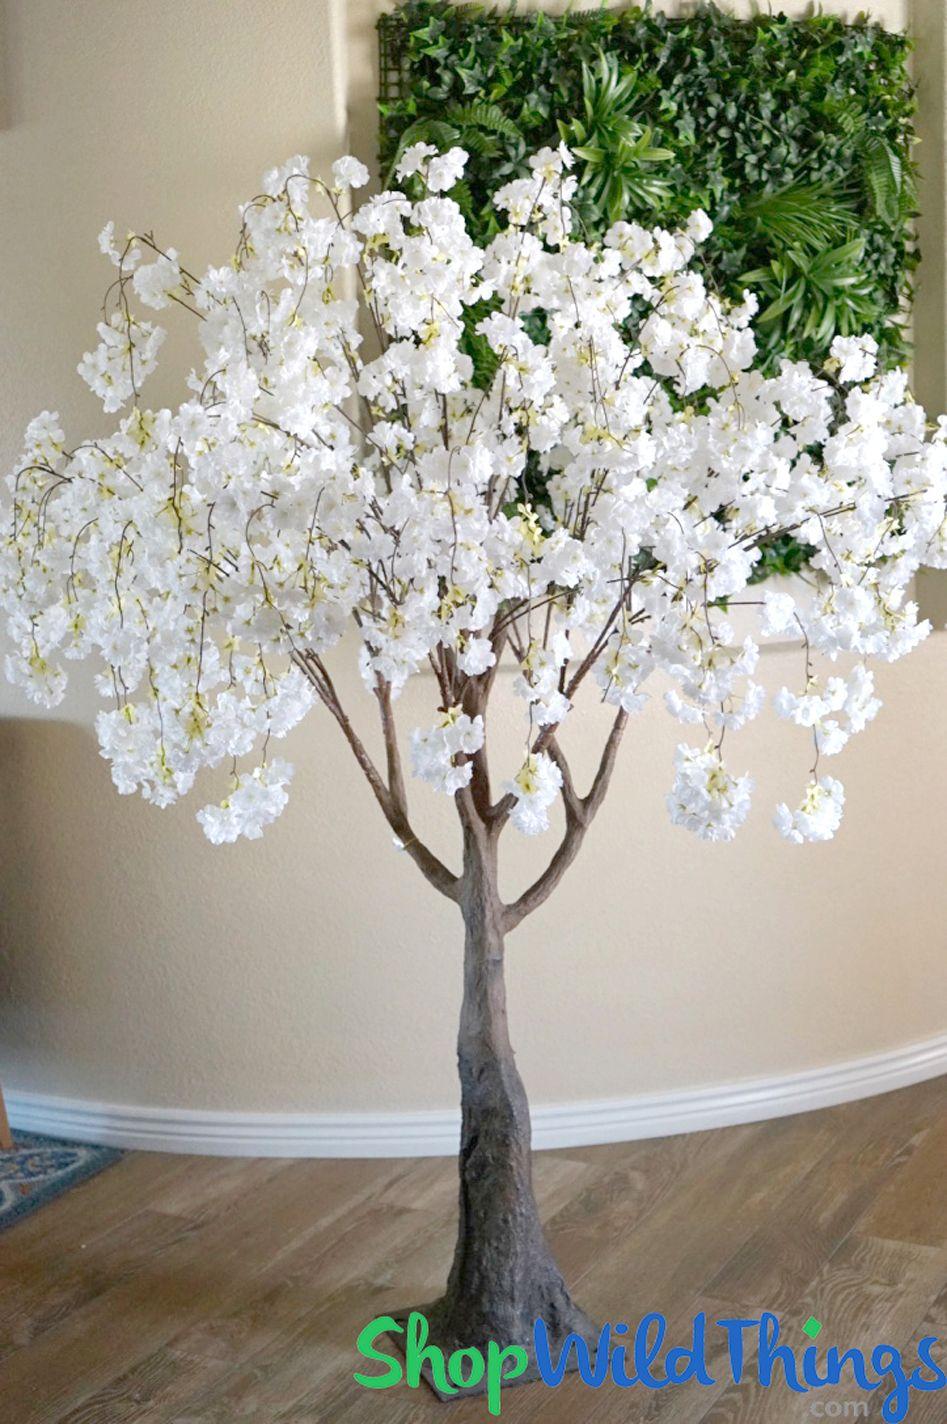 Flowering Cherry Blossom Tree Extra Full 6 Tall White Blossom Trees Flower Wall Decor Cherry Blossom Tree